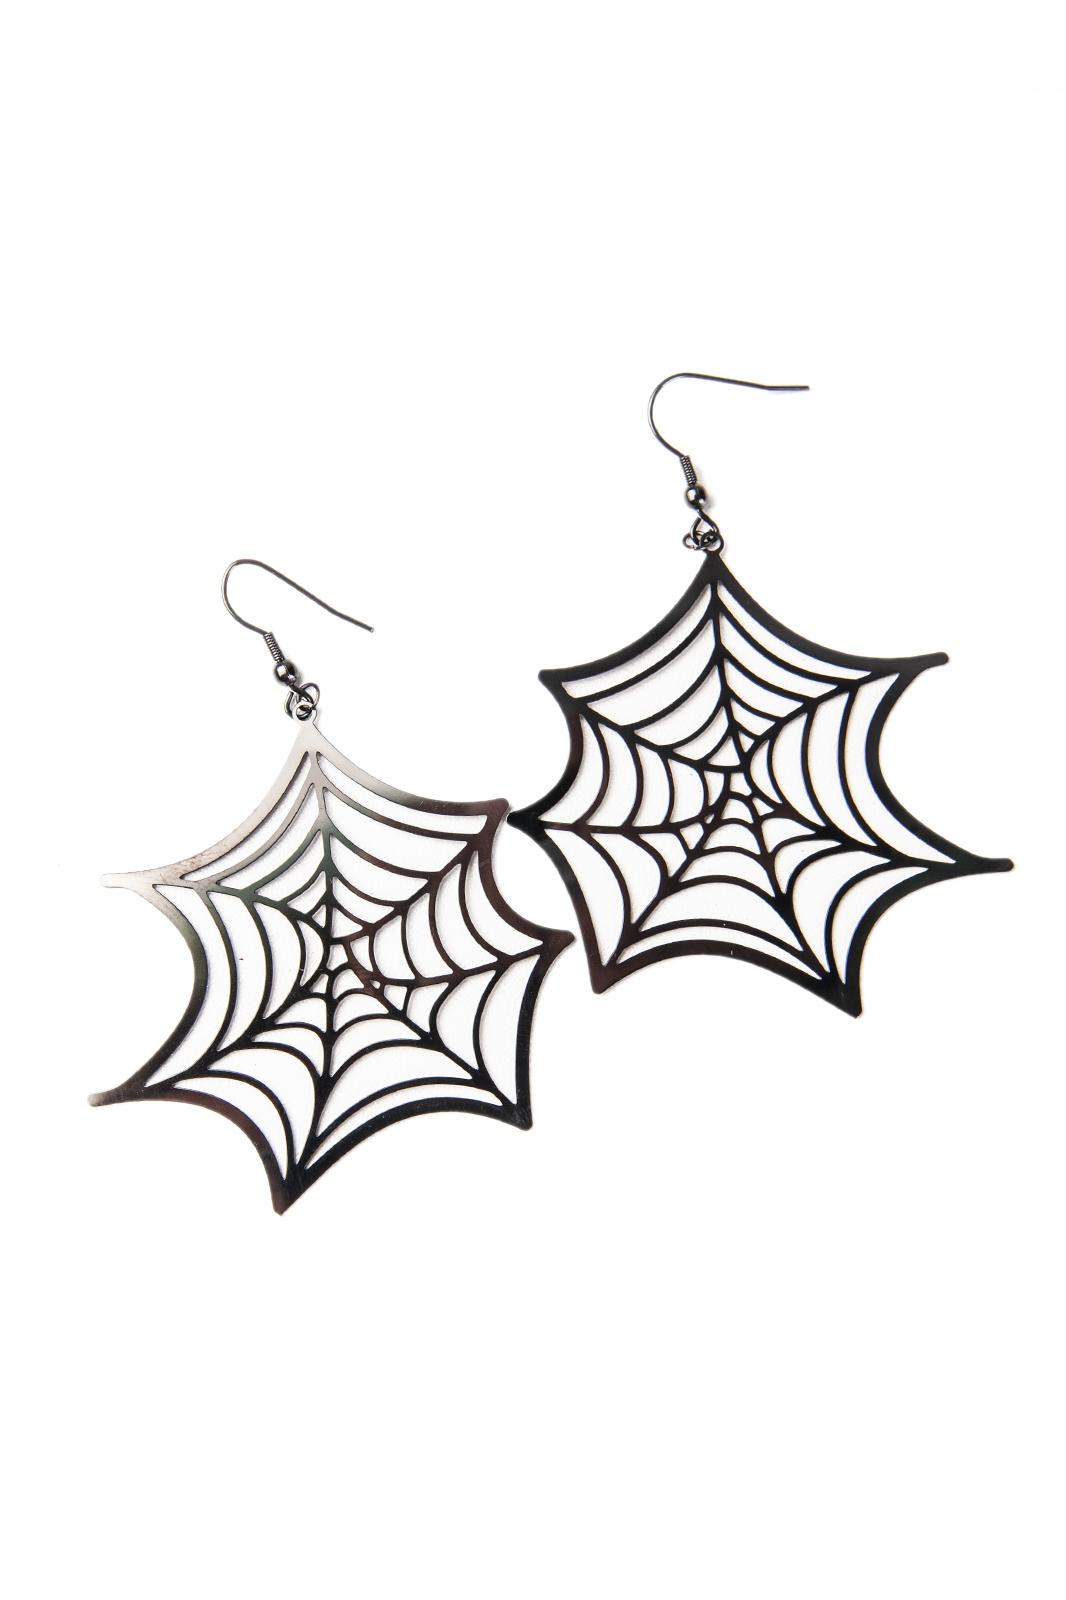 Spider Web Stainless Steel Earrings